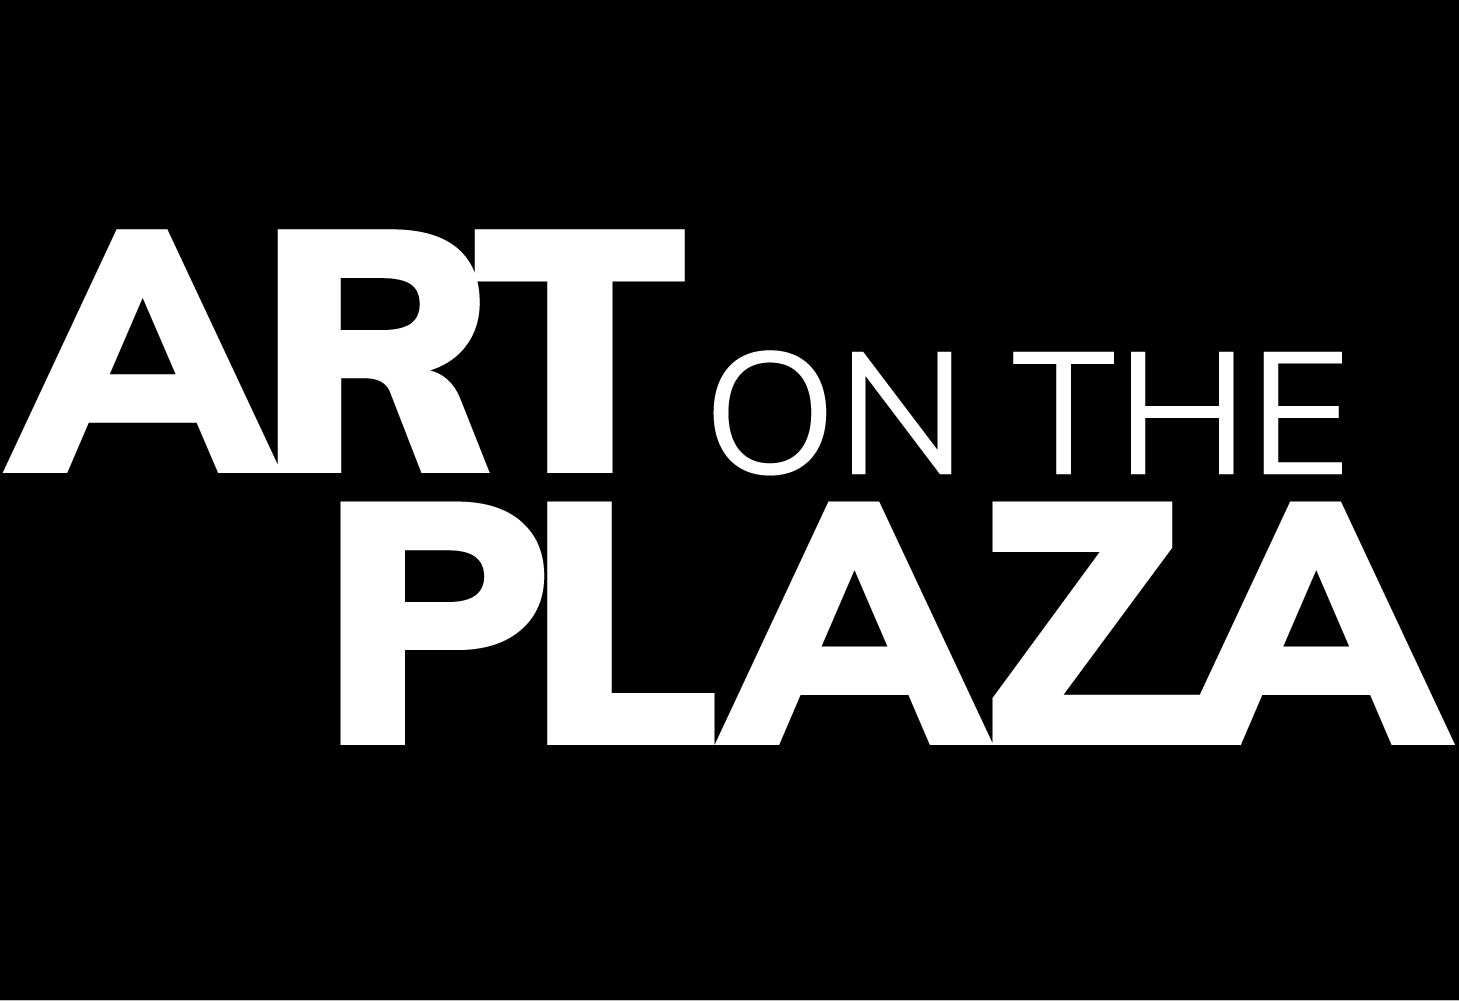 Art on the plaza